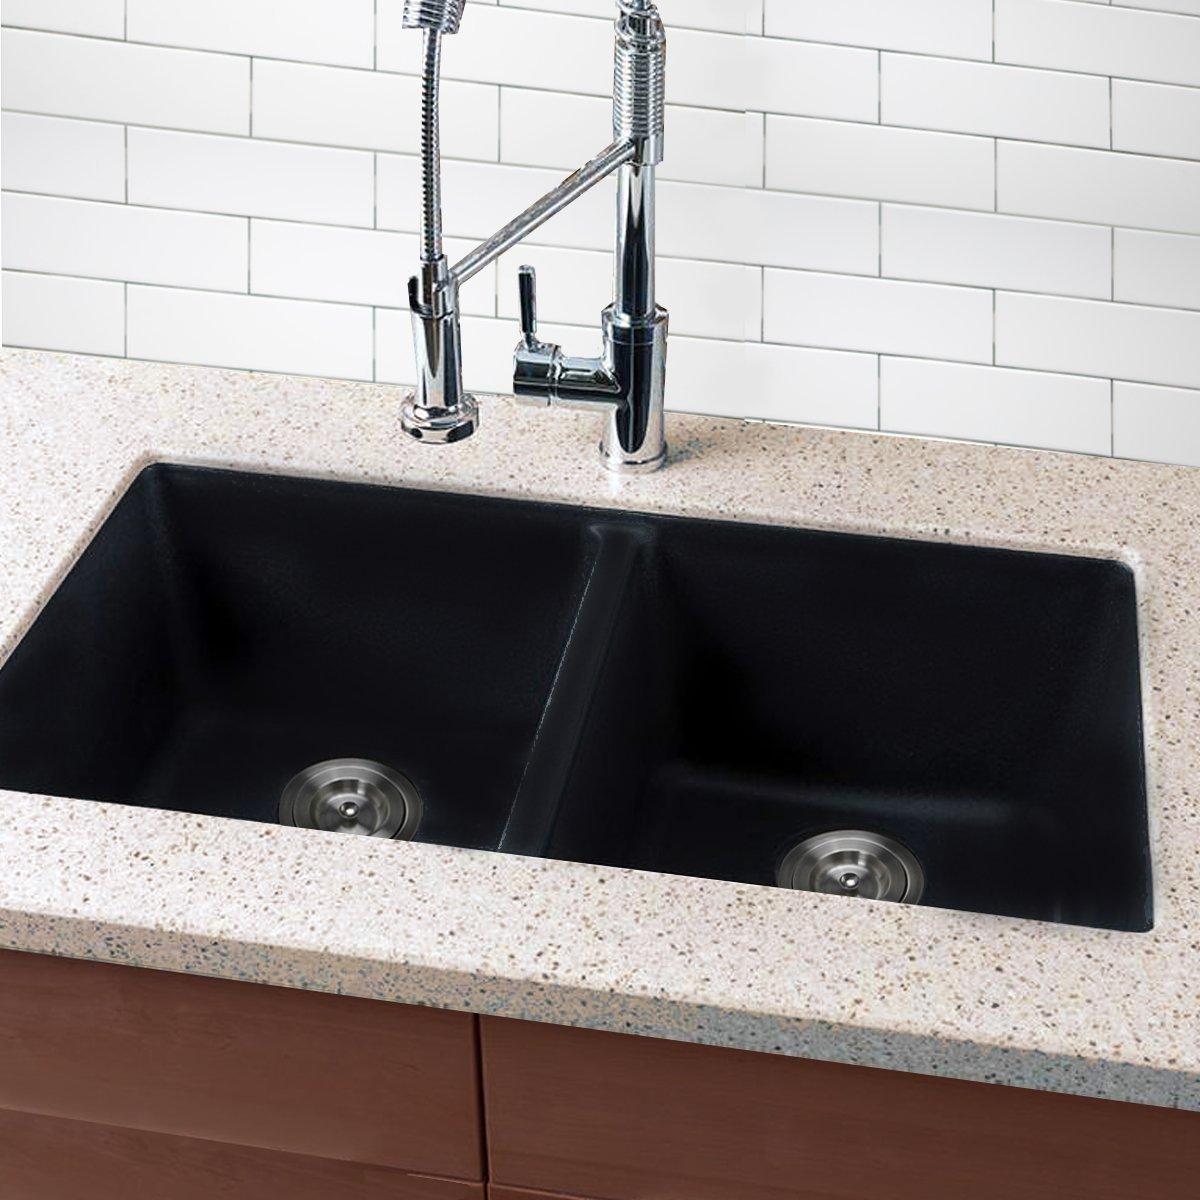 Cheap Carysil Granite Kitchen Sinks Find Carysil Granite Kitchen Sinks Deals On Line At Alibaba Com